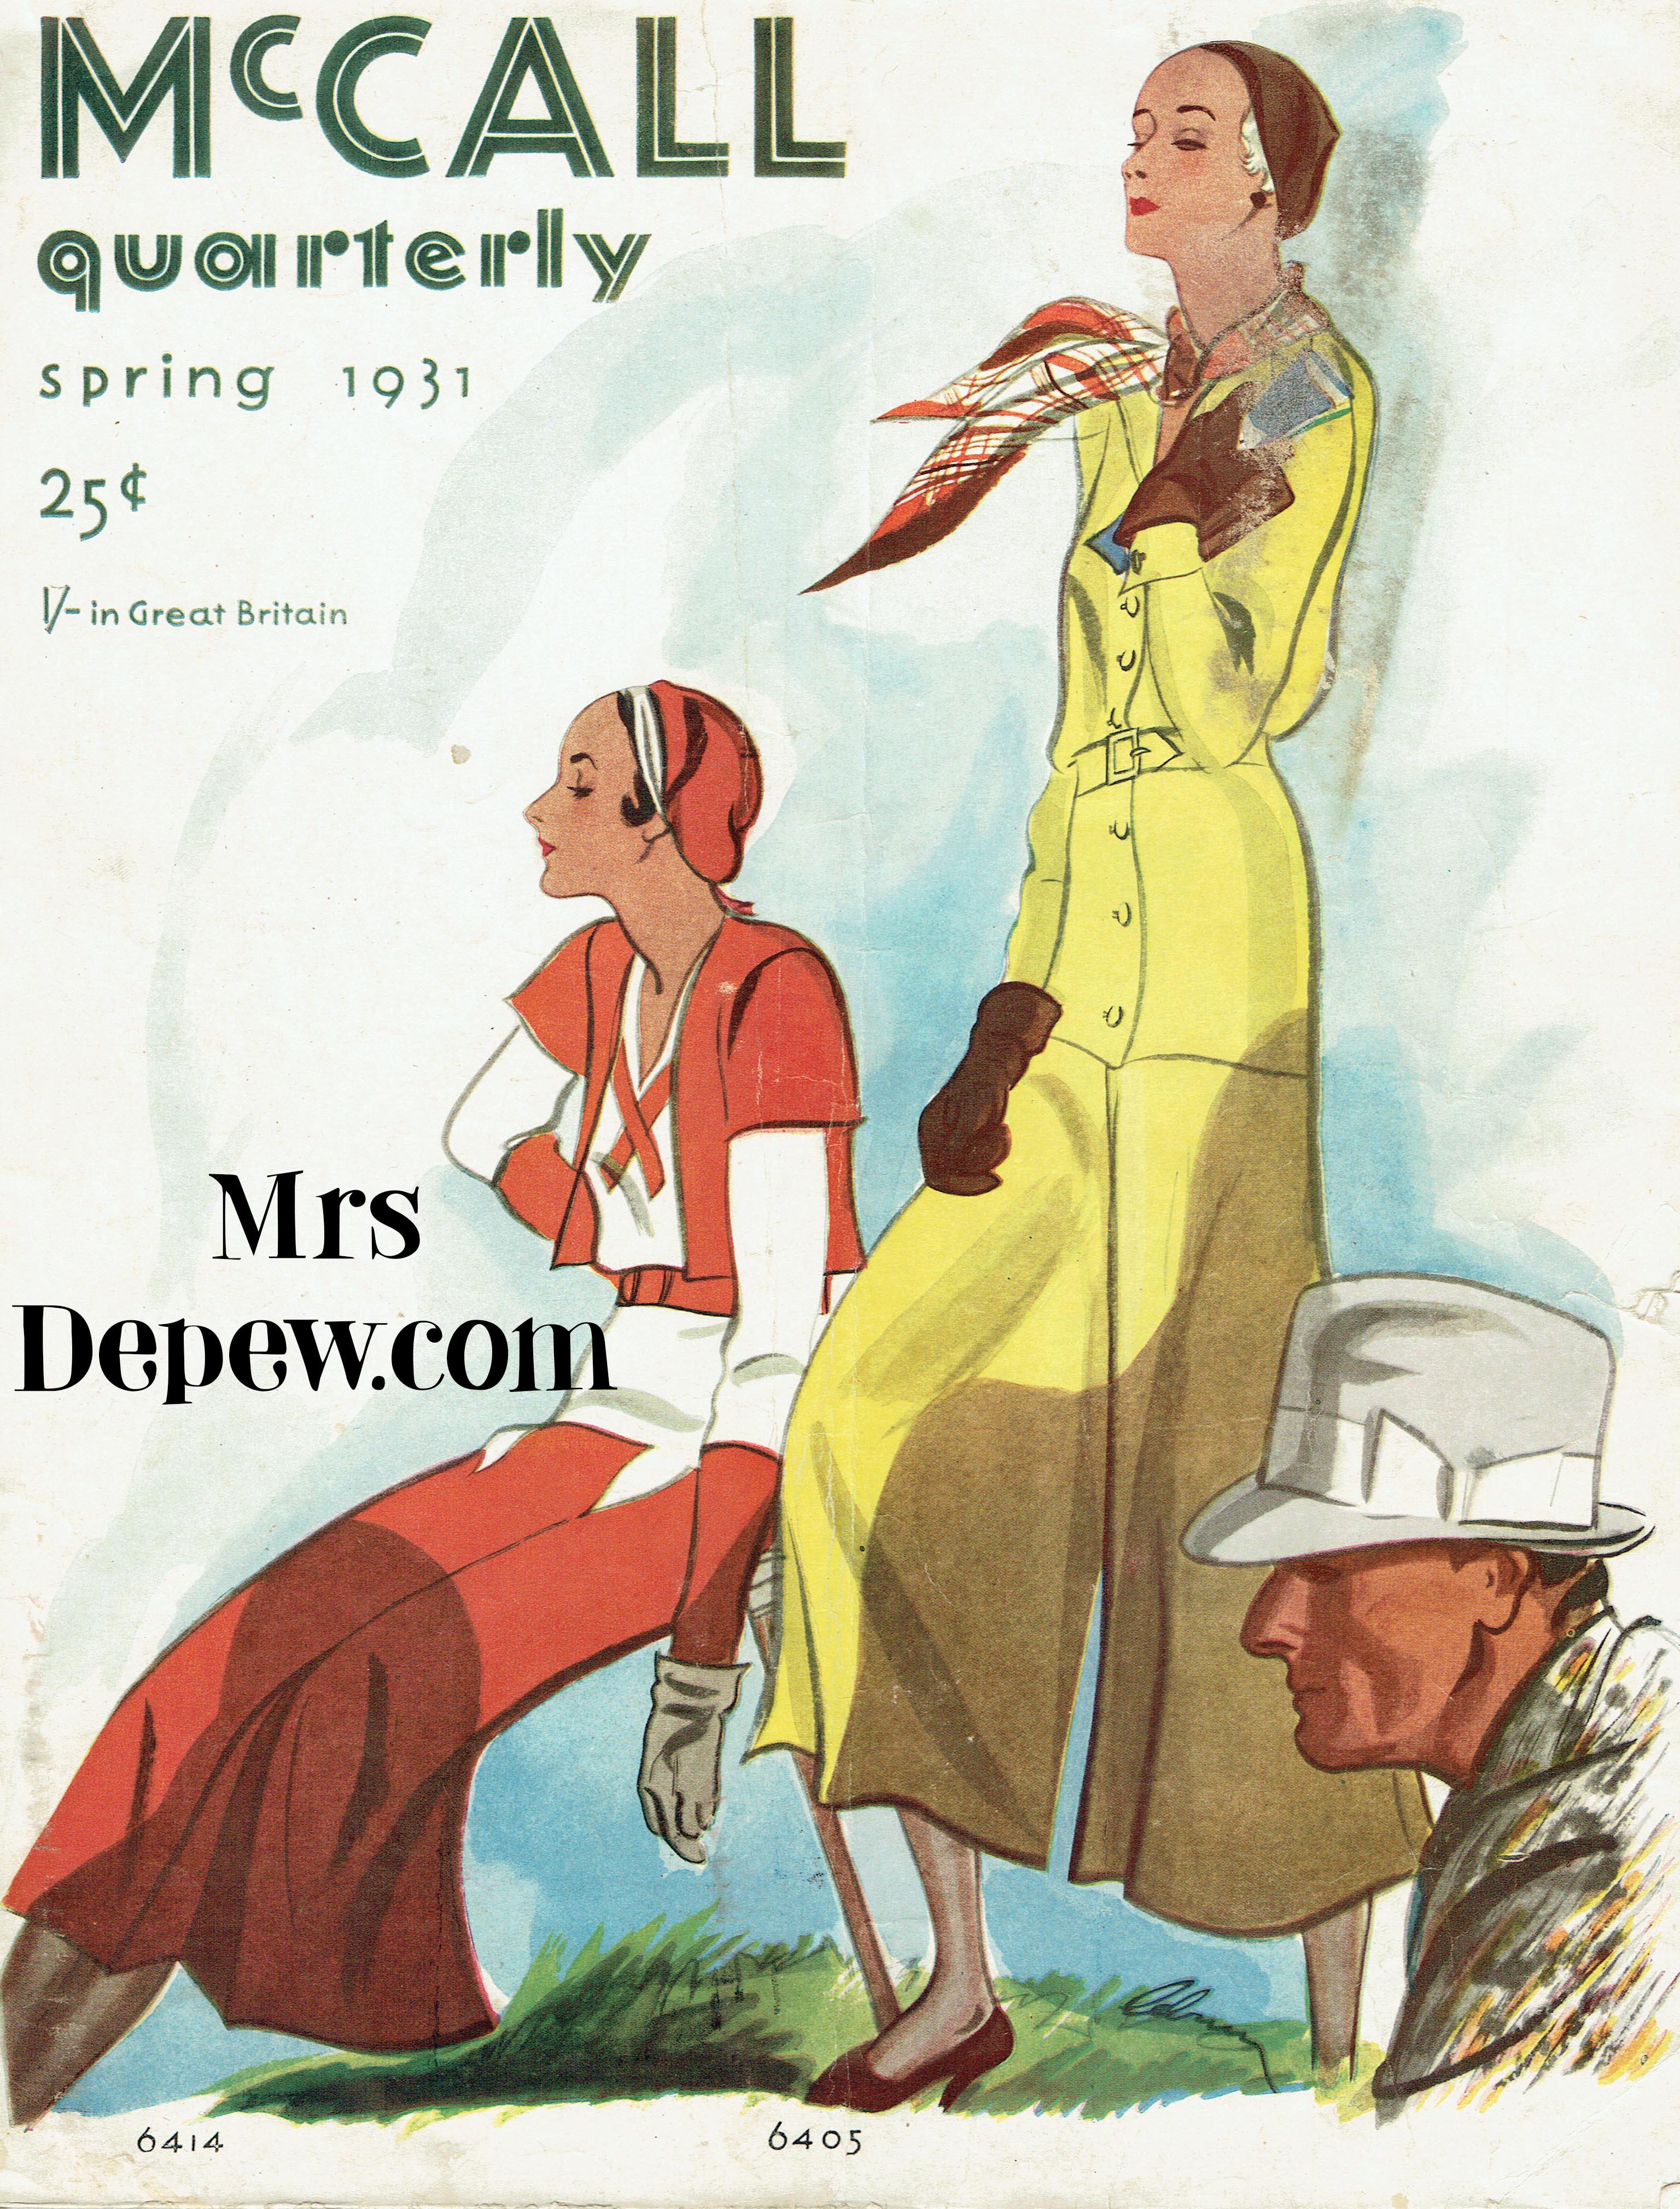 McCall Quarterly Spring 1931